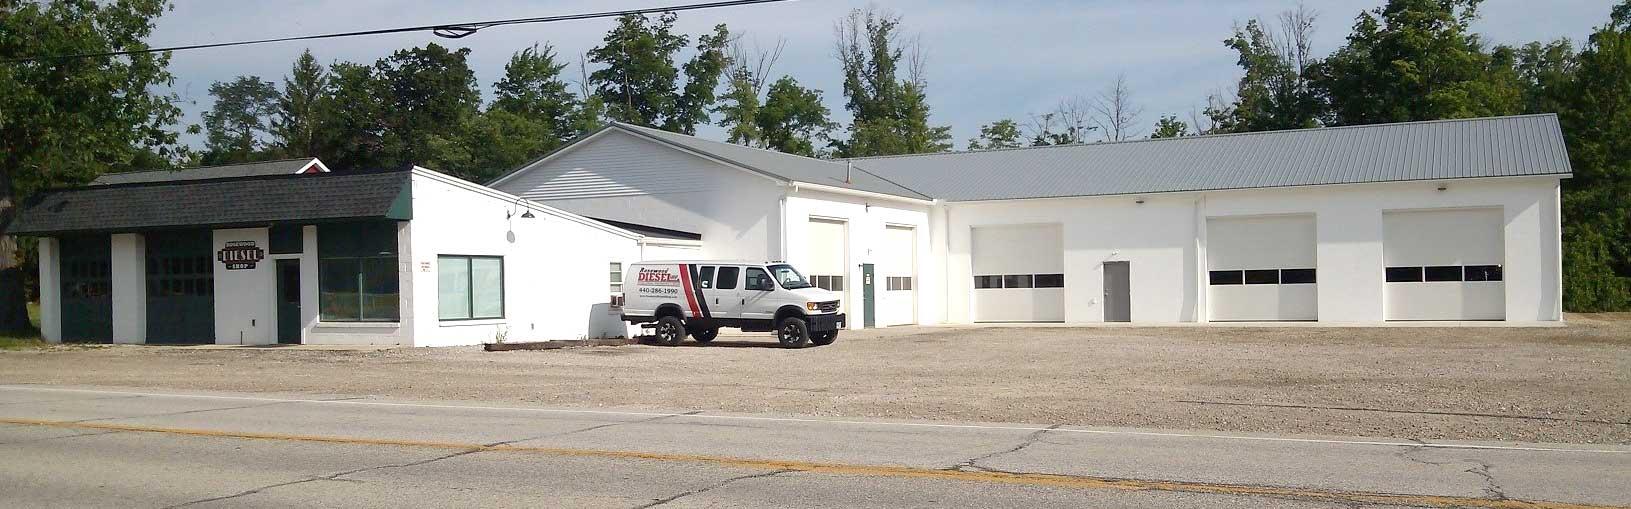 Fuel Injectors Light Truck Repair Rosewood Diesel Shop Of 2001 F250 7 3 Glow Plug Wiring Harness Our